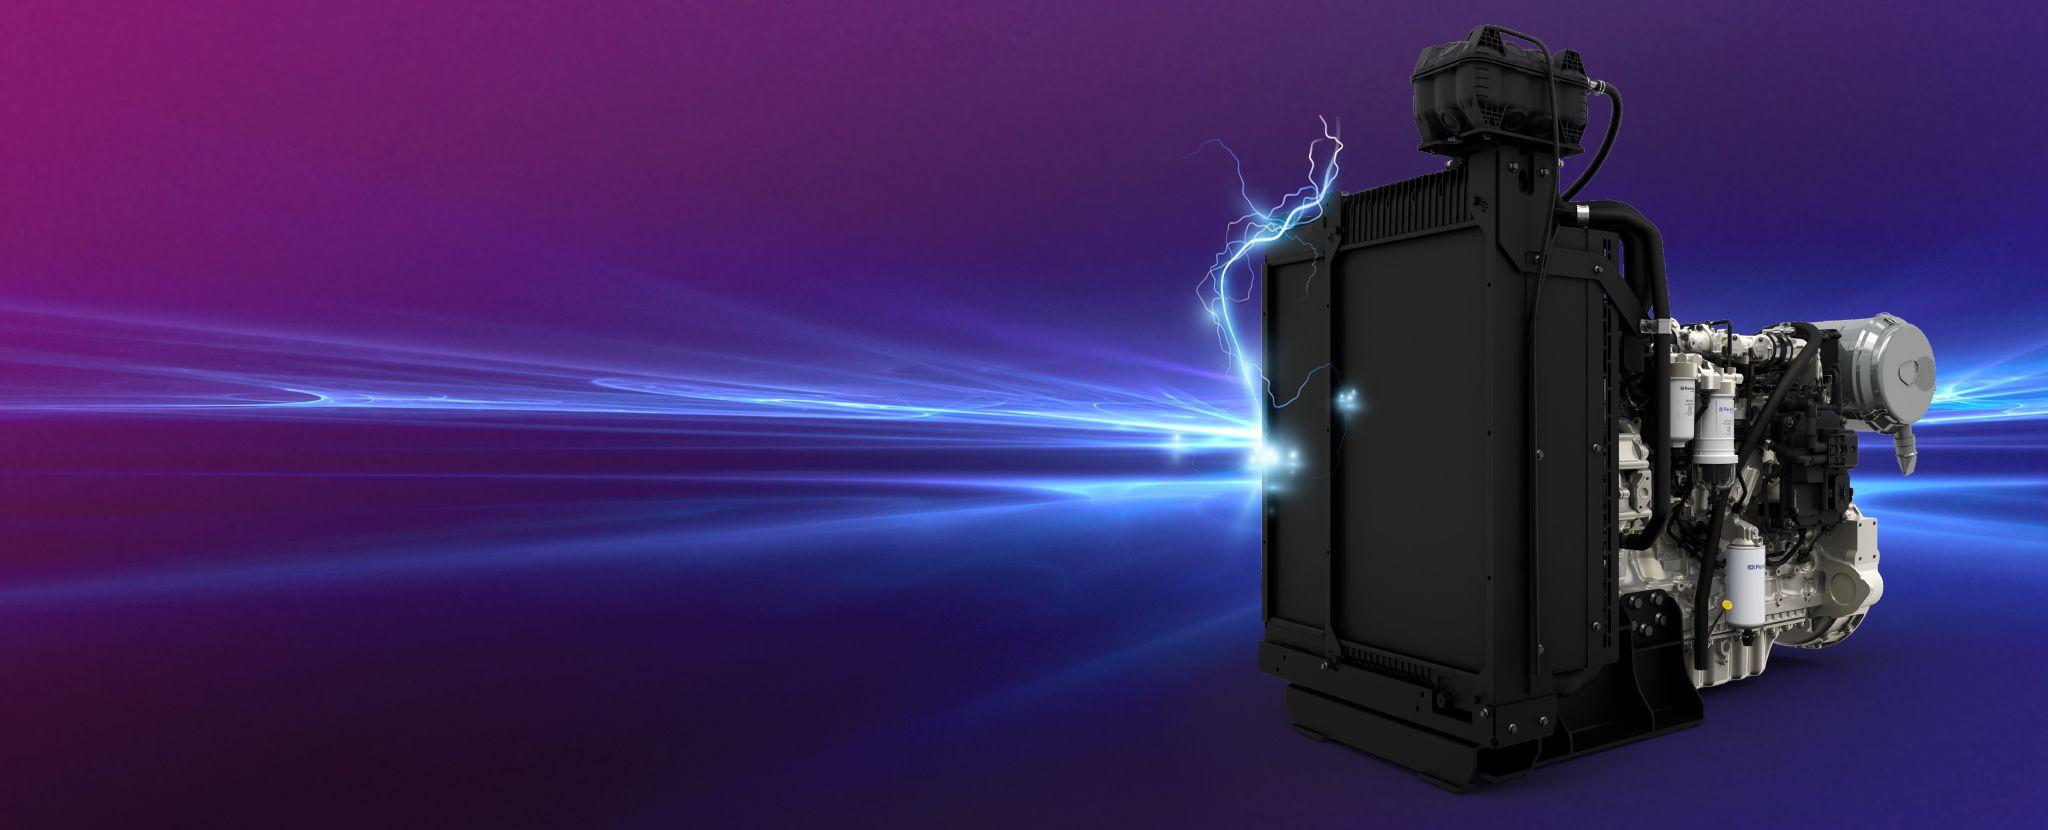 A revolution in<br>power density